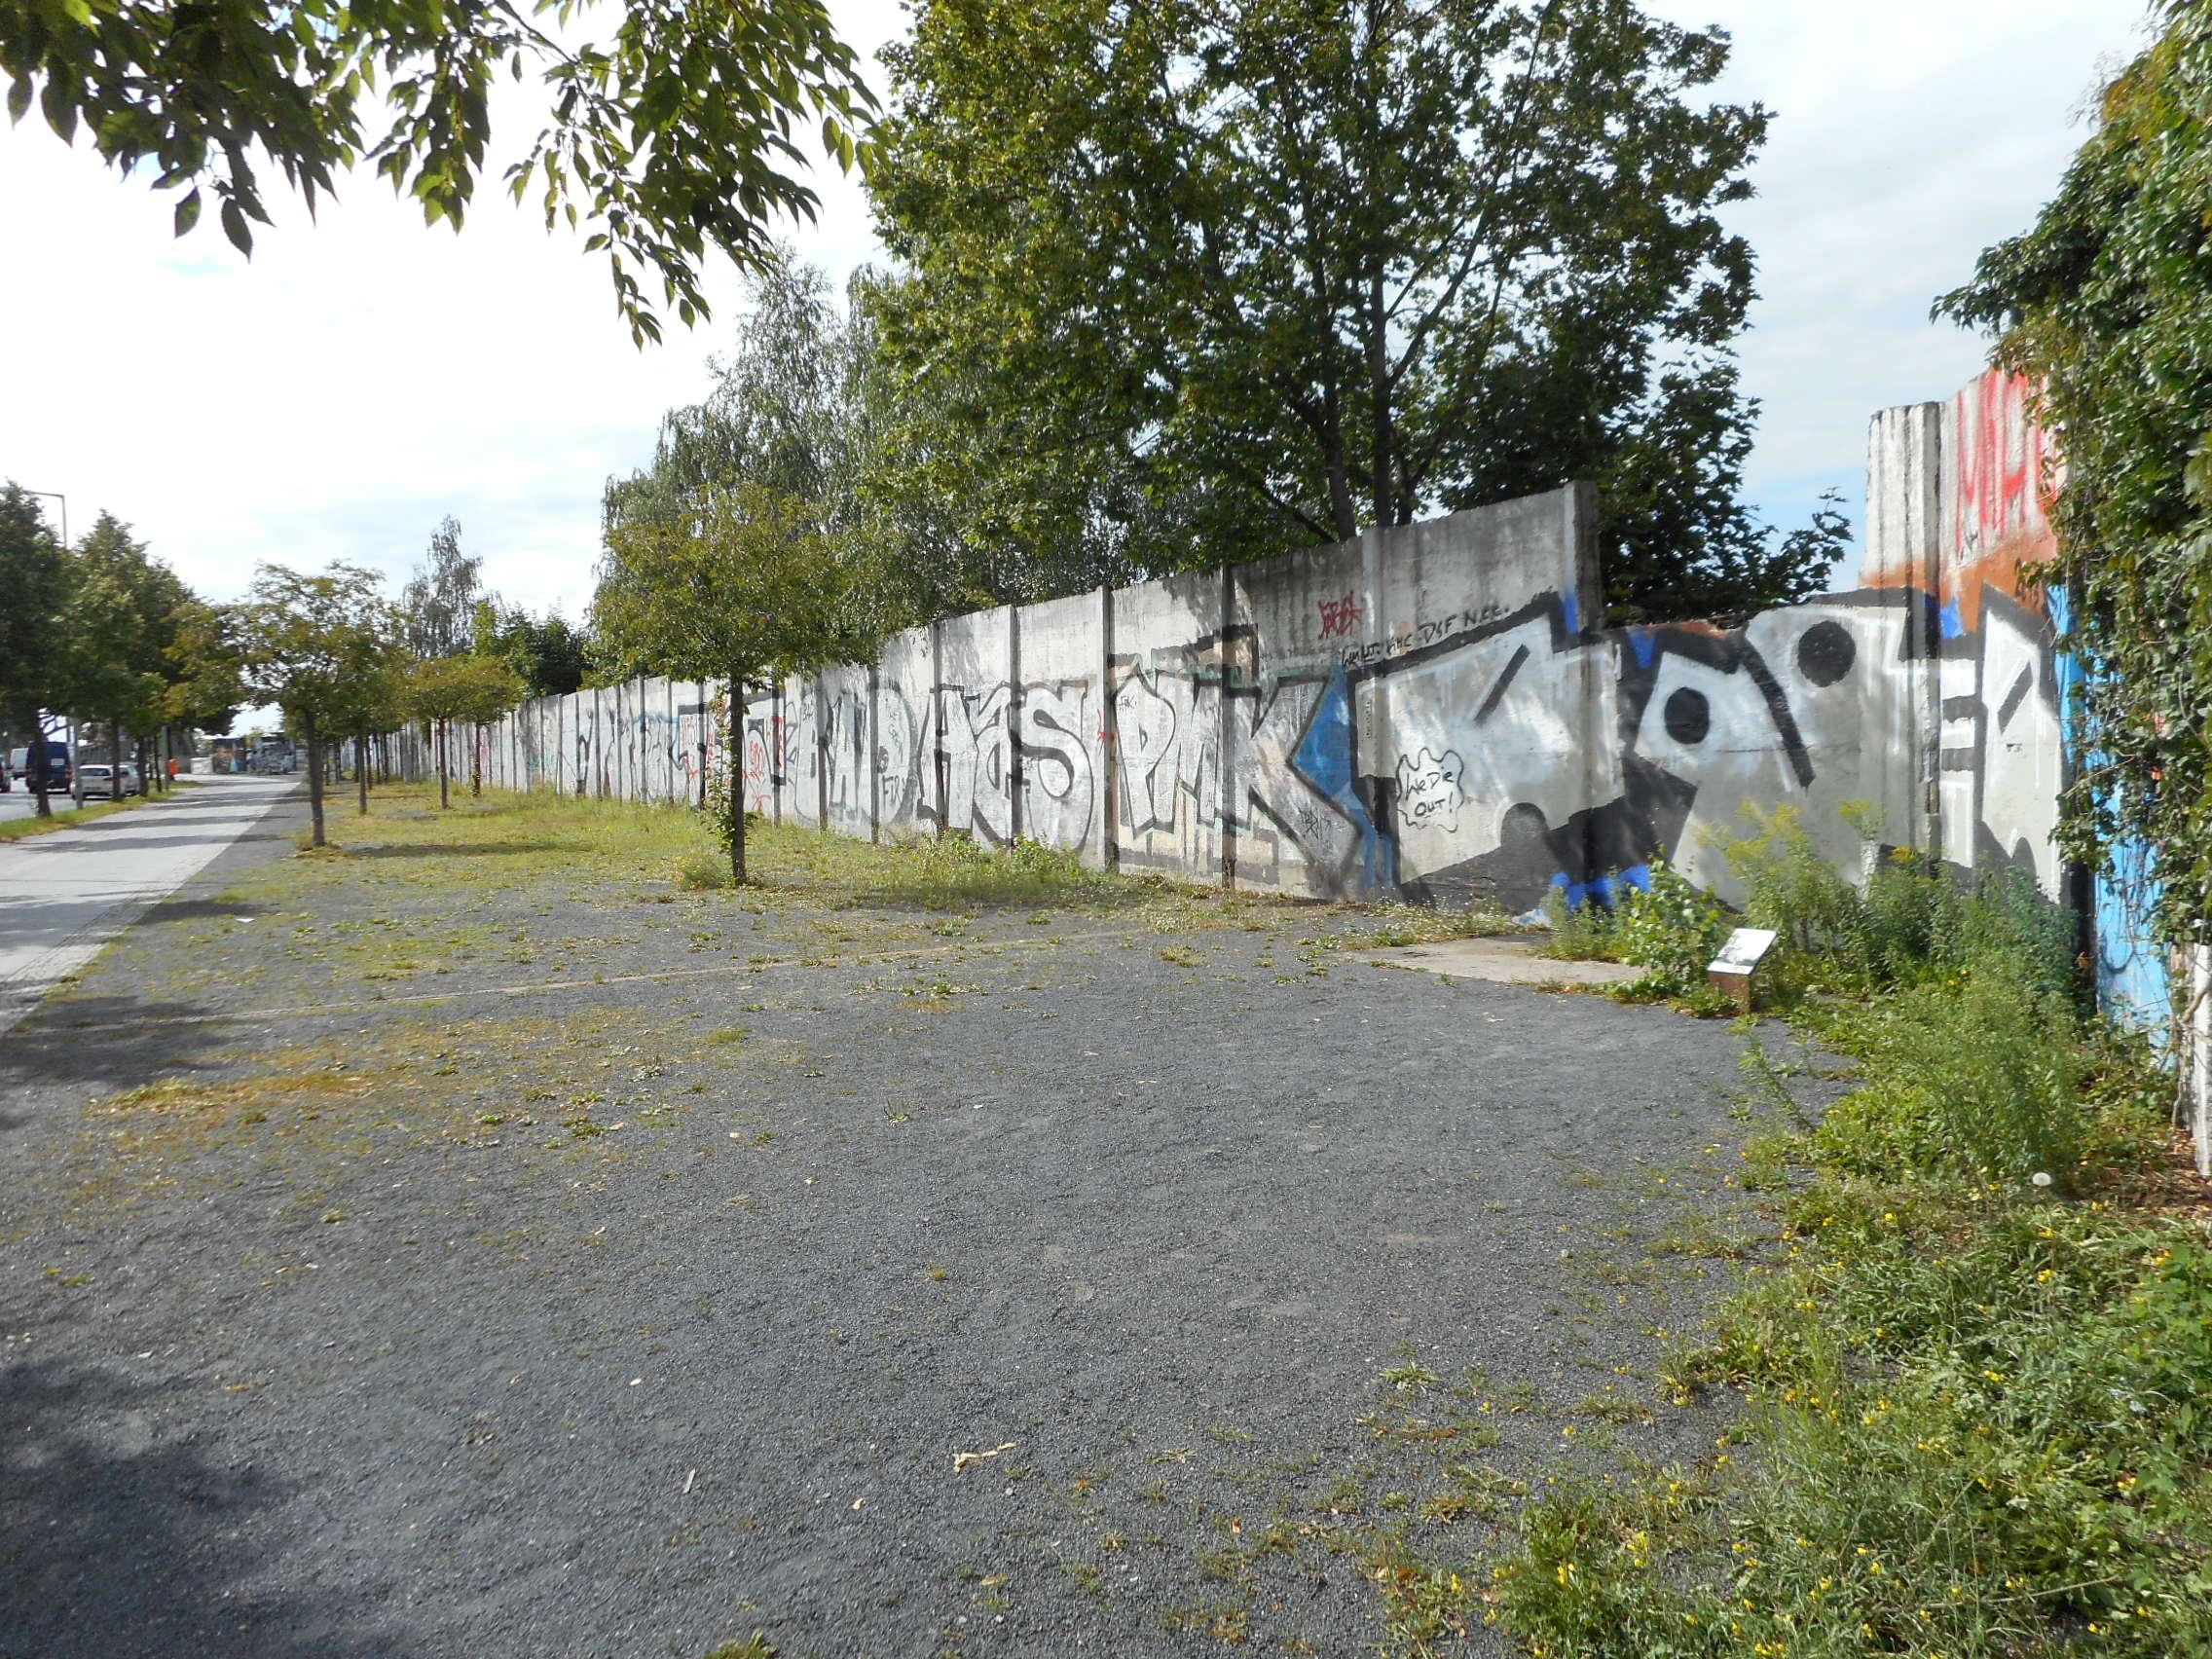 platz-des-9-november-1989-today-wall